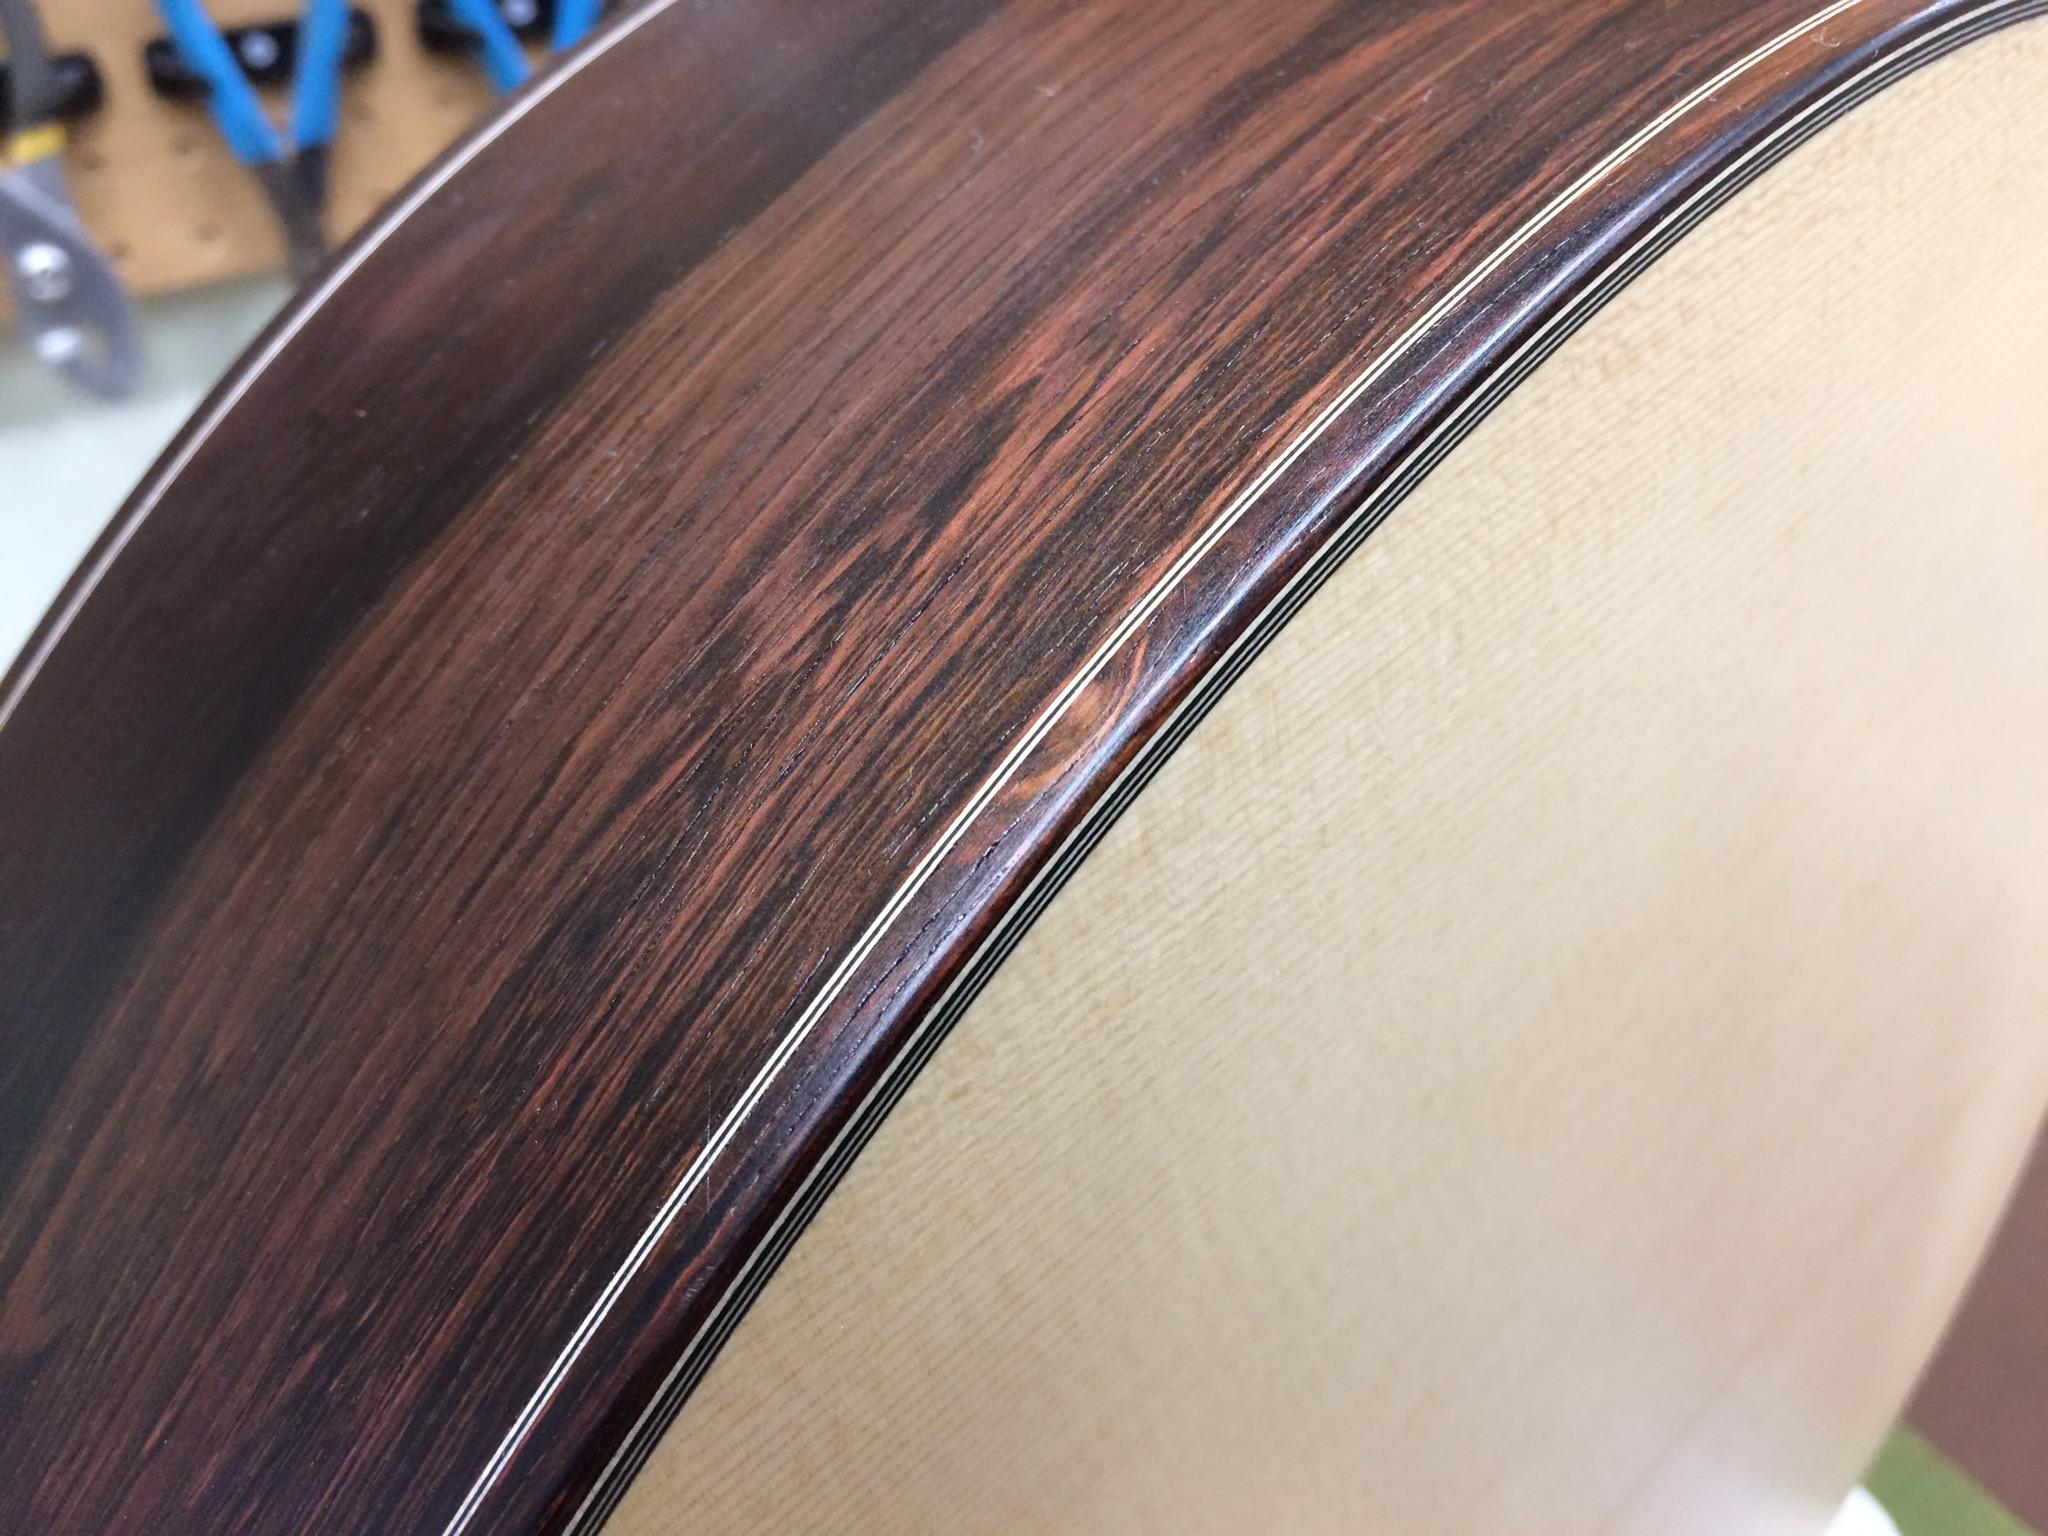 Binding and purfling detail.